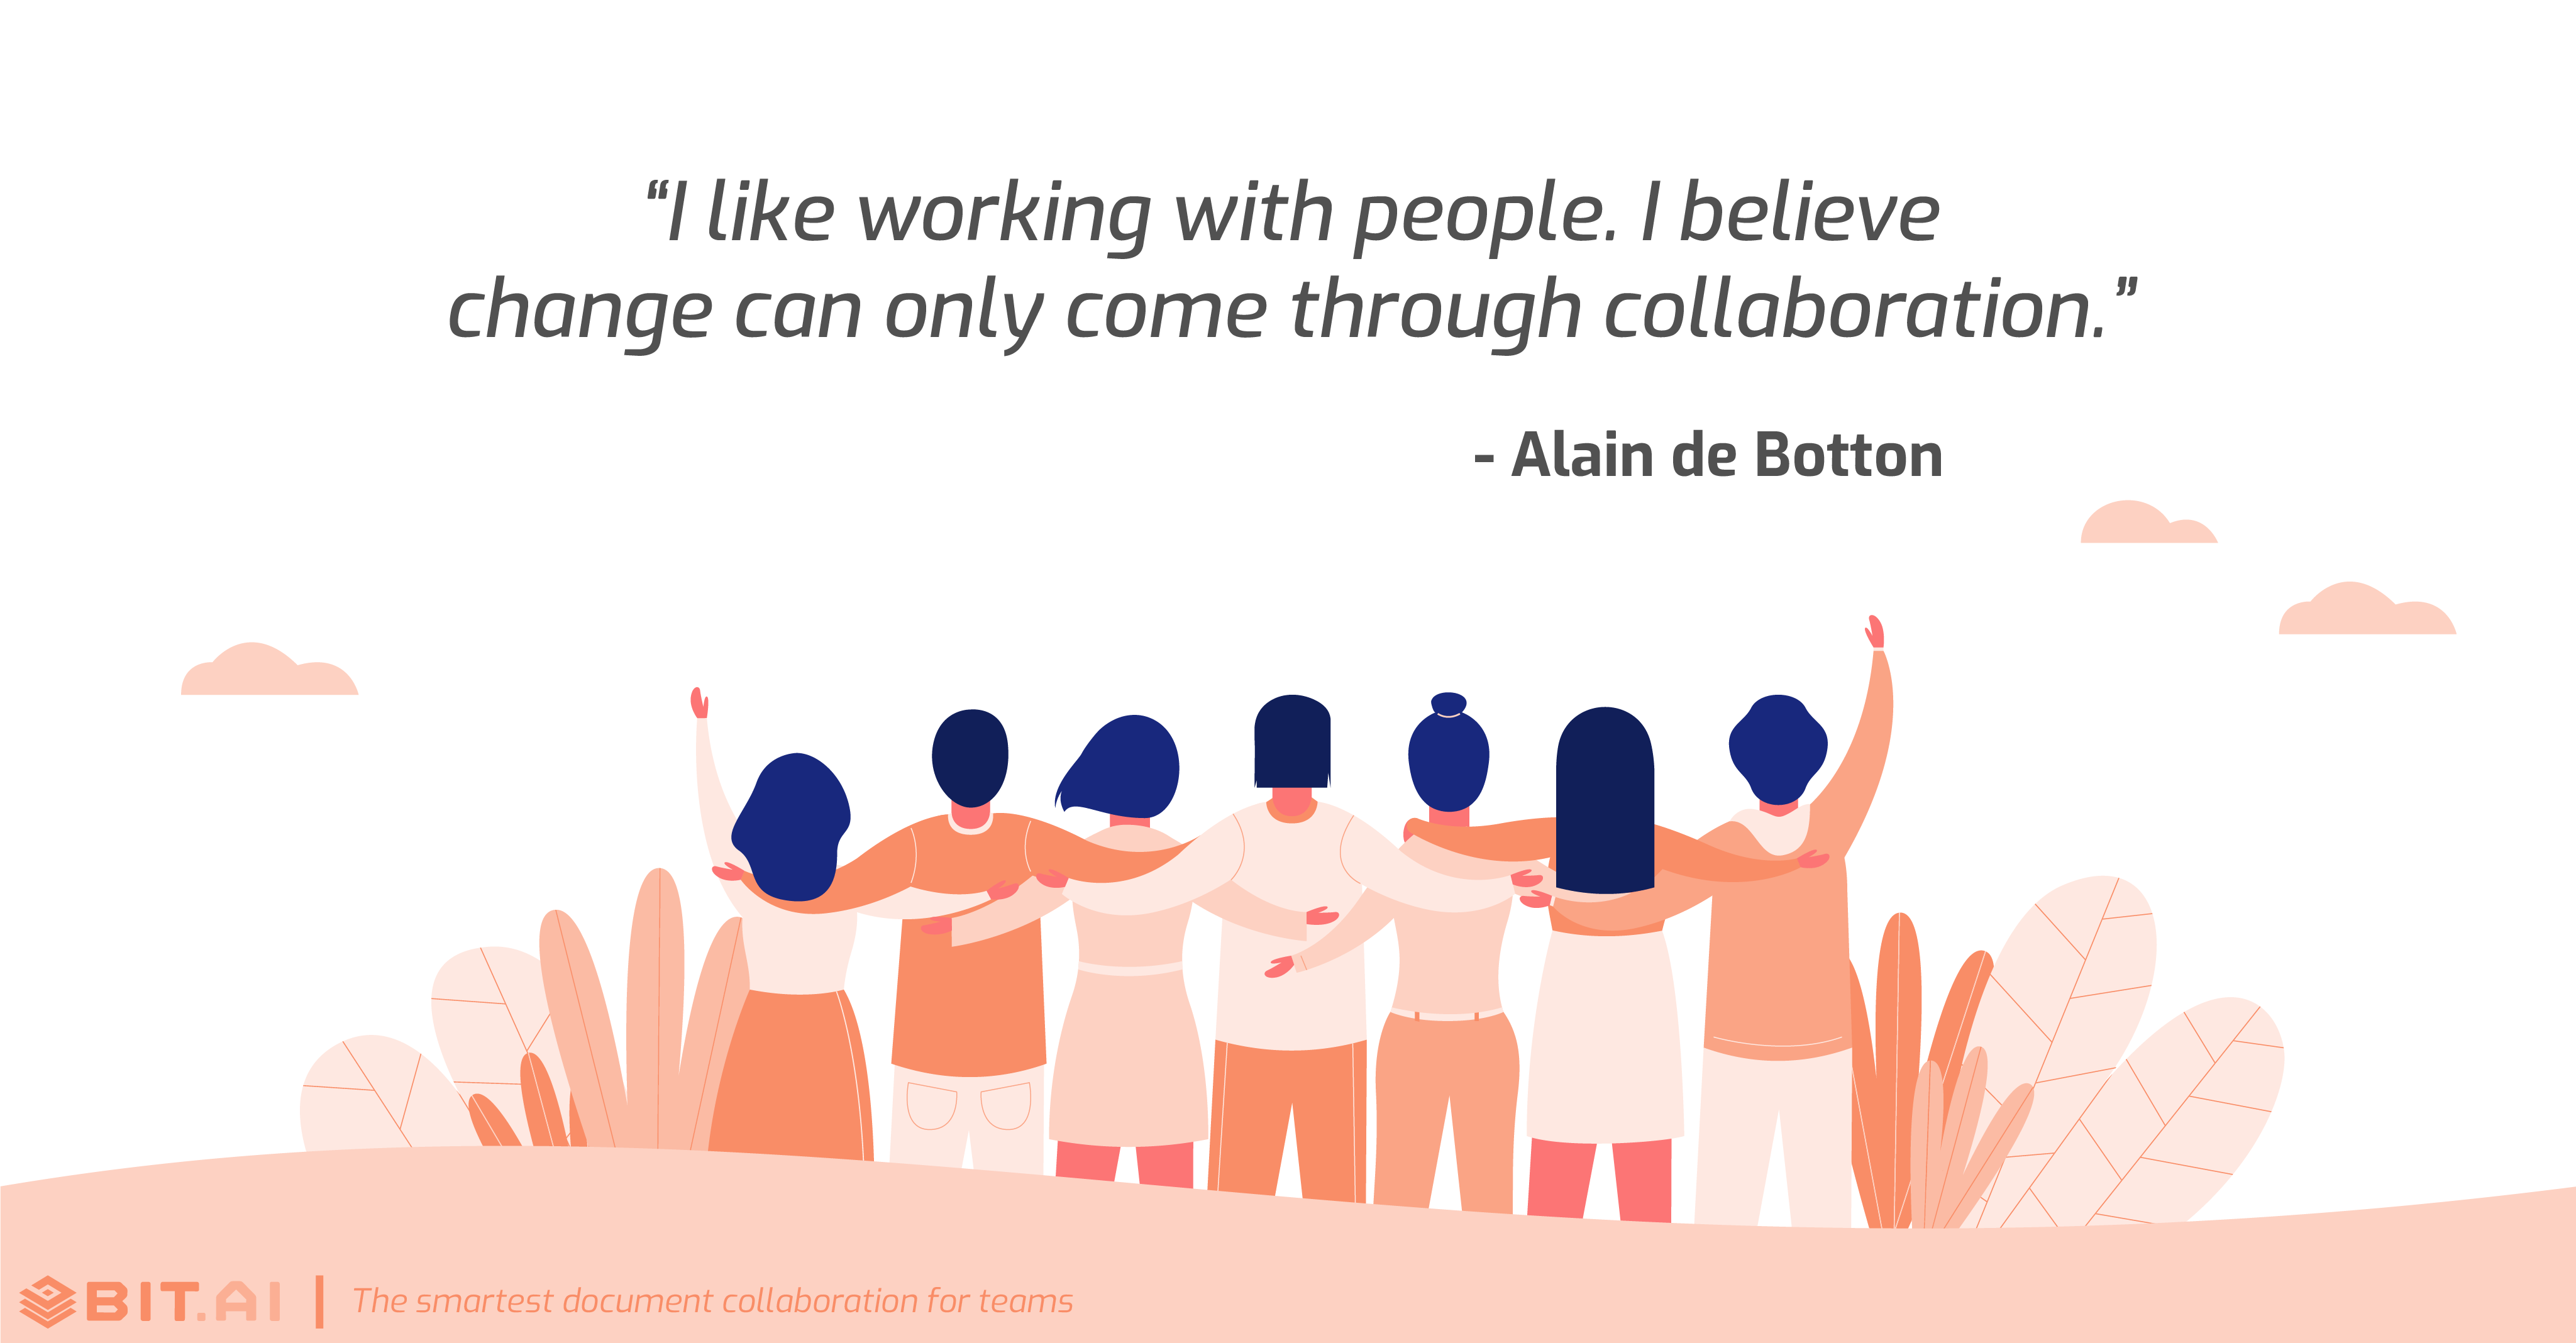 Teamwork collaboration quote by Alain de Botton